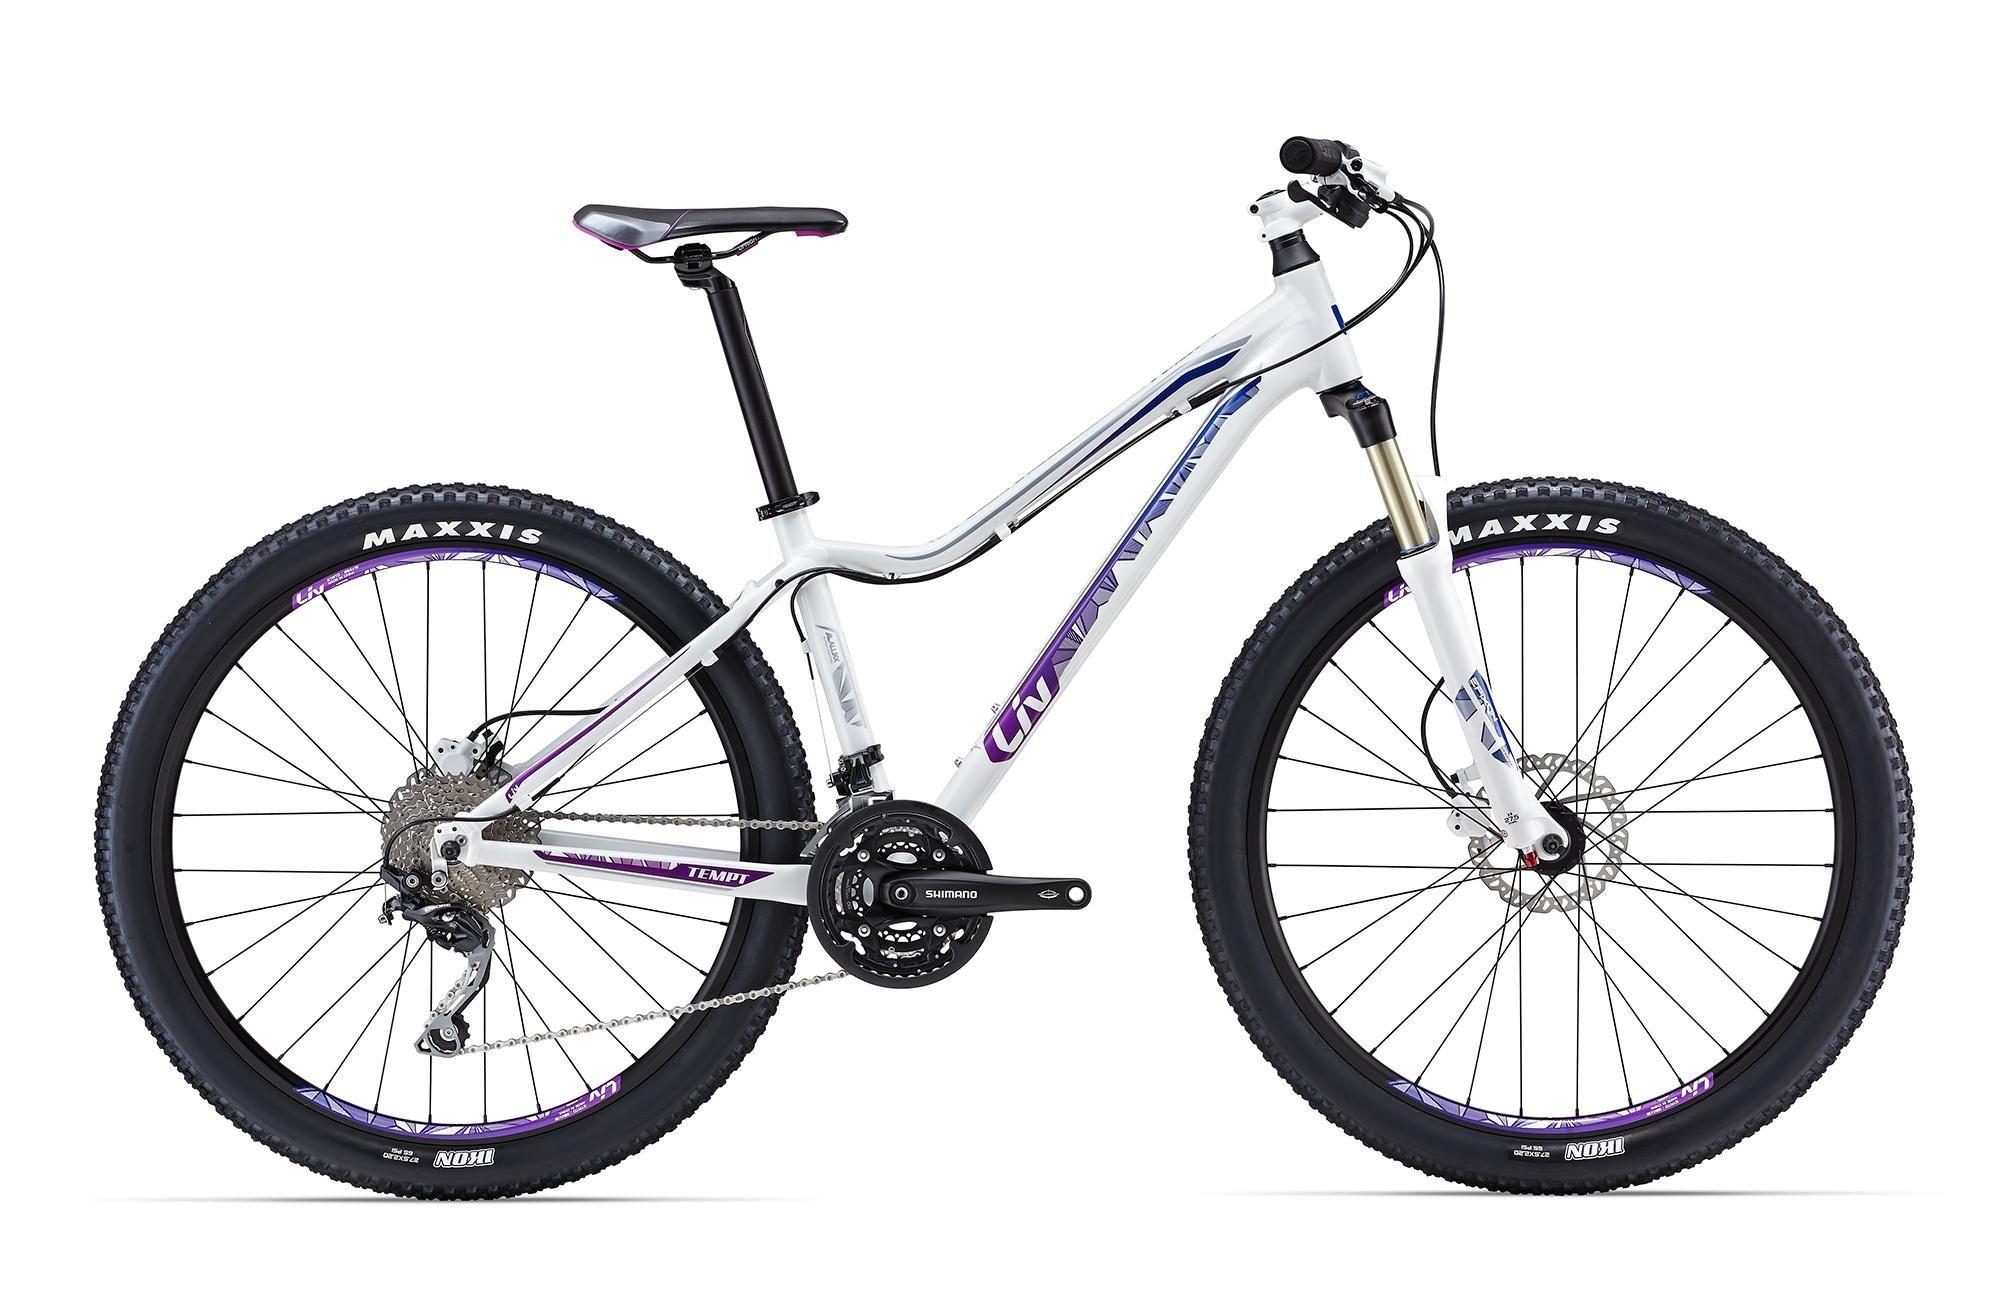 Edinburgh Bike Shop Online Road Mountain Bikes With Price Mountain Biking Giant Bicycles Bike